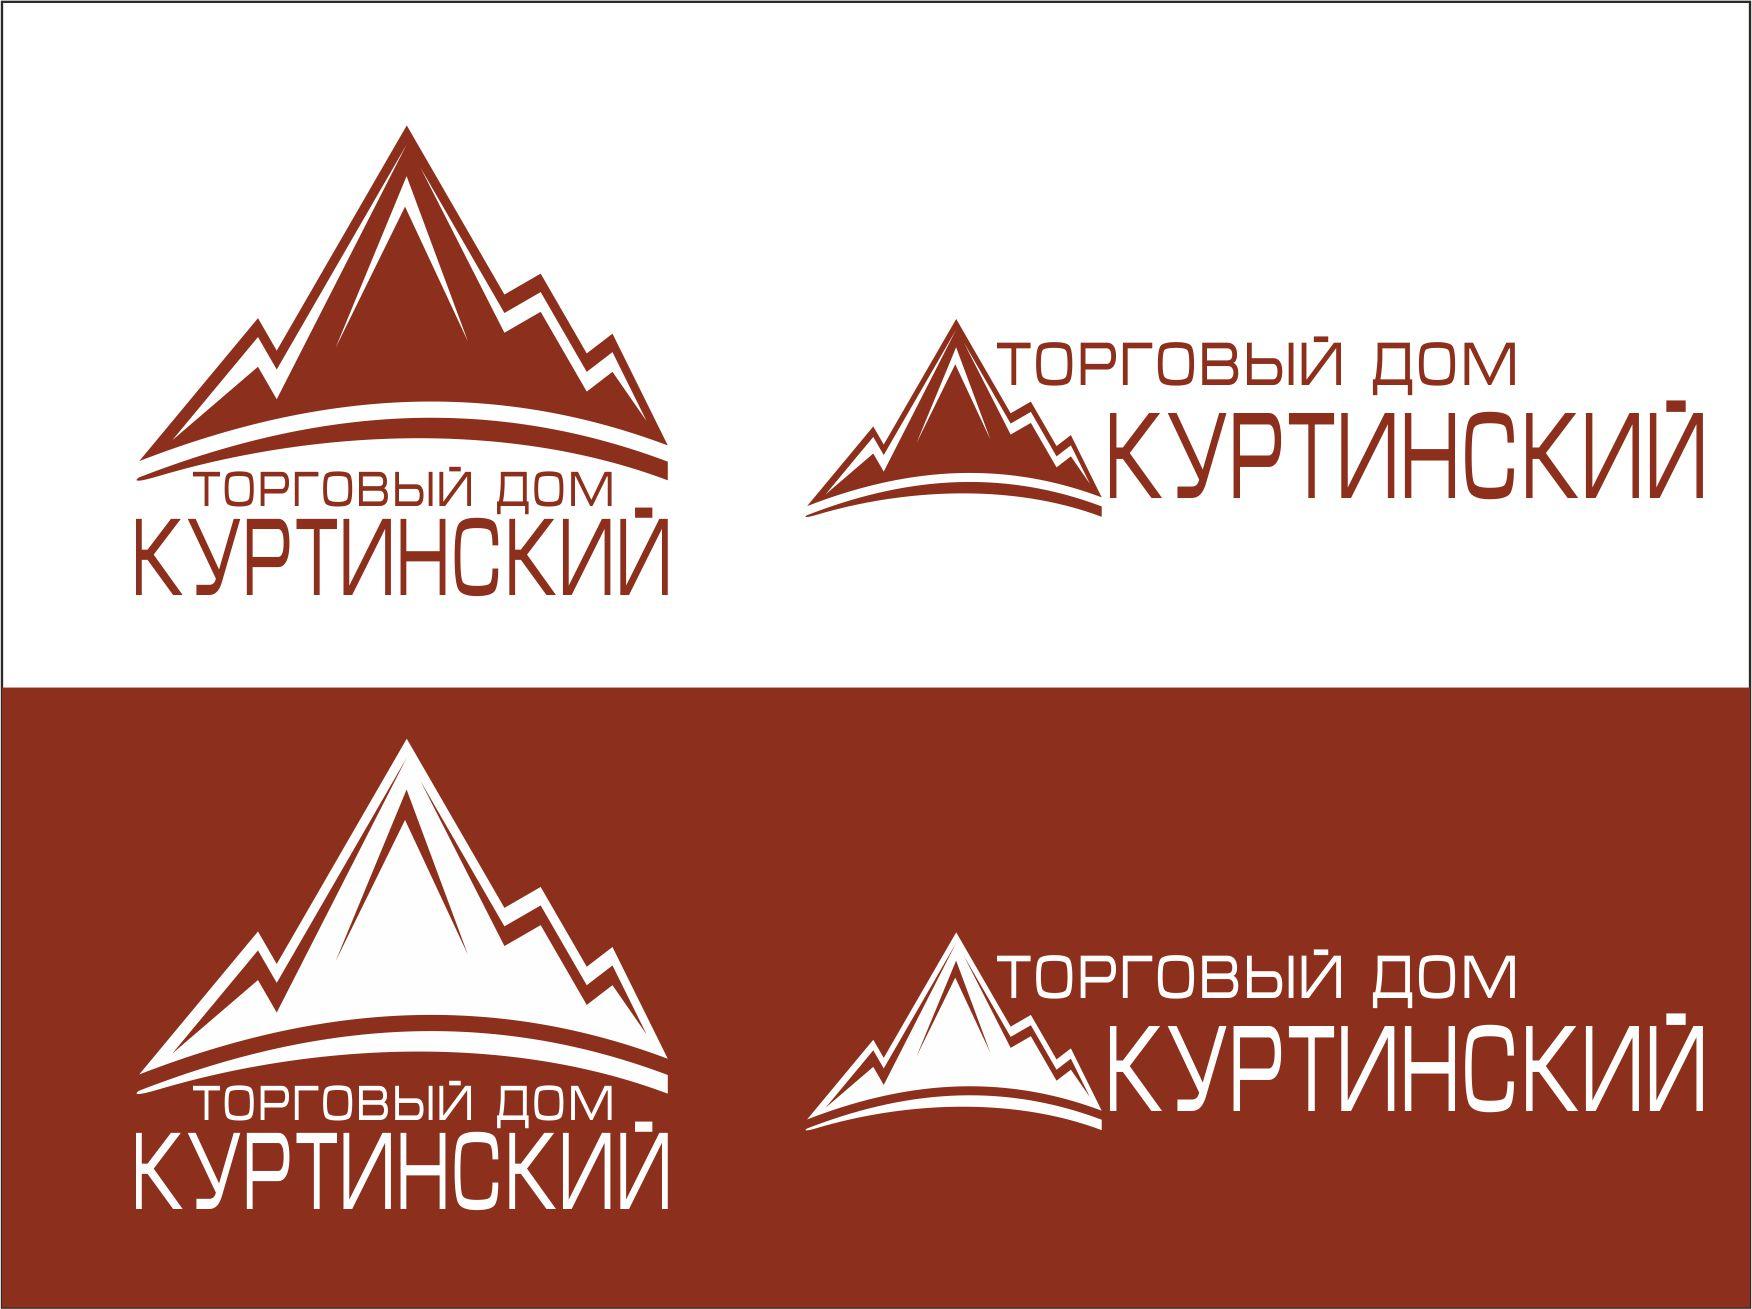 Логотип для камнедобывающей компании фото f_3355b98eddd5a3ab.jpg